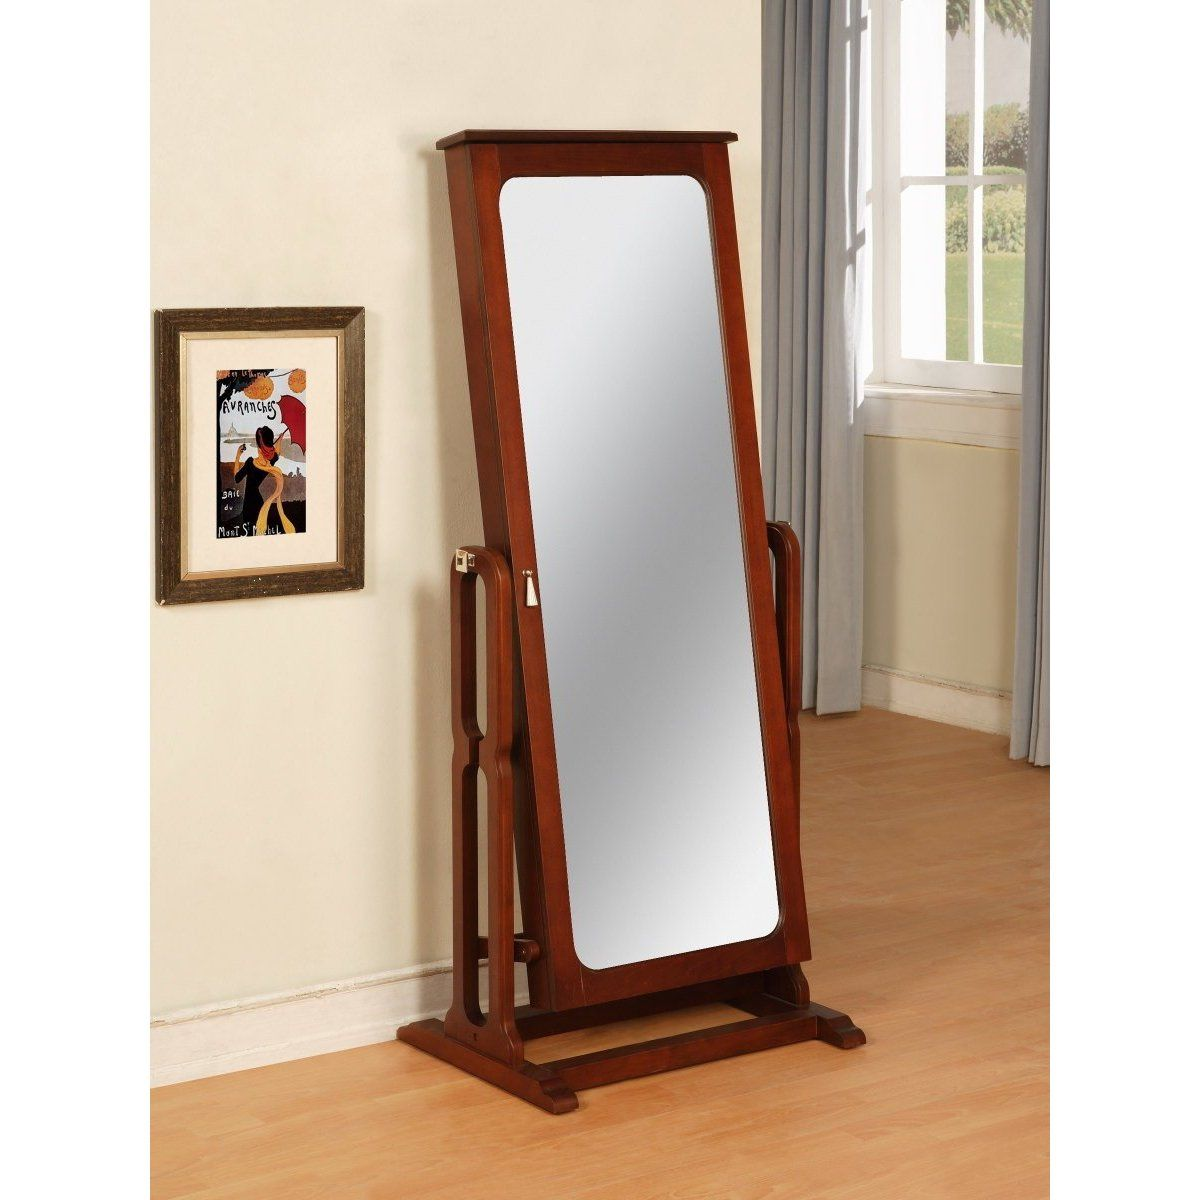 solid wood cherry storage jewelry wardrobe floor cheval mirror floor mirror. Black Bedroom Furniture Sets. Home Design Ideas